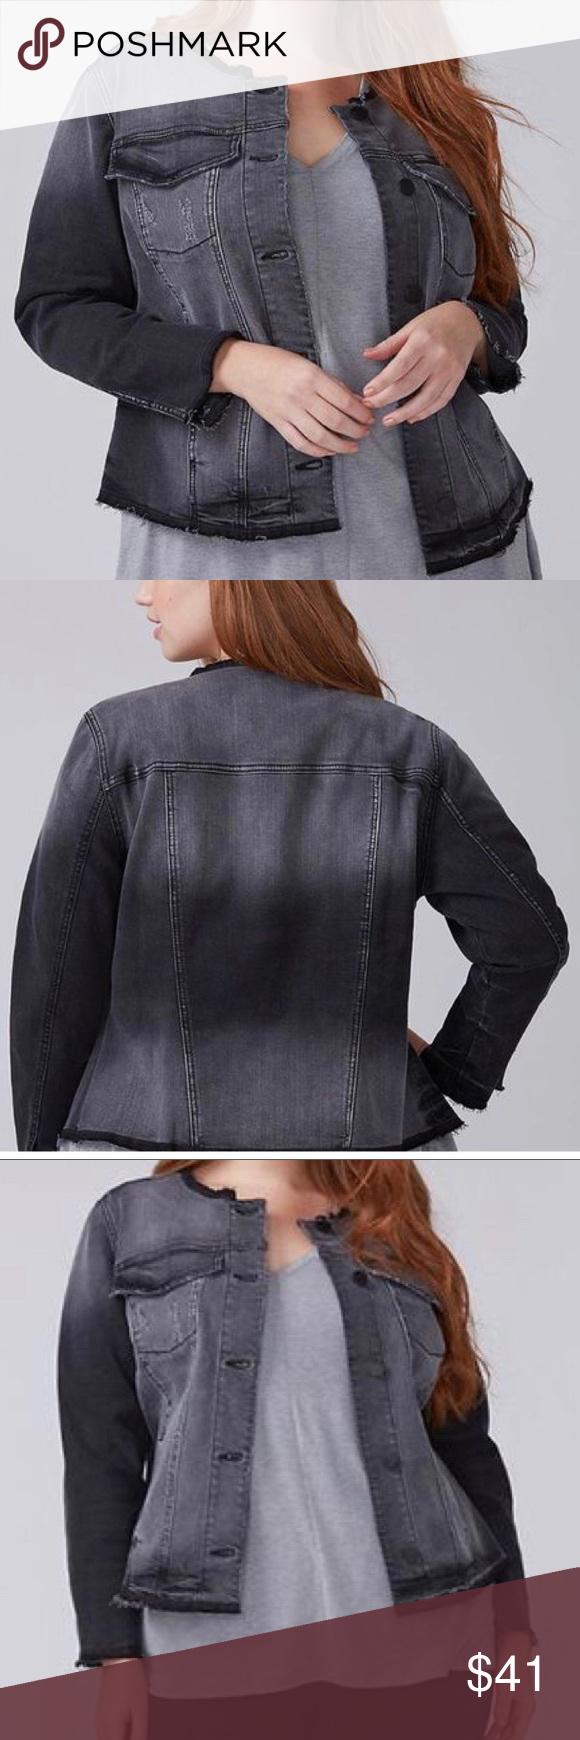 Lane Bryant Sz 28 Nwt Faded Black Denim Jacket Denim Jacket Black Denim Jacket Black Denim [ 1740 x 580 Pixel ]